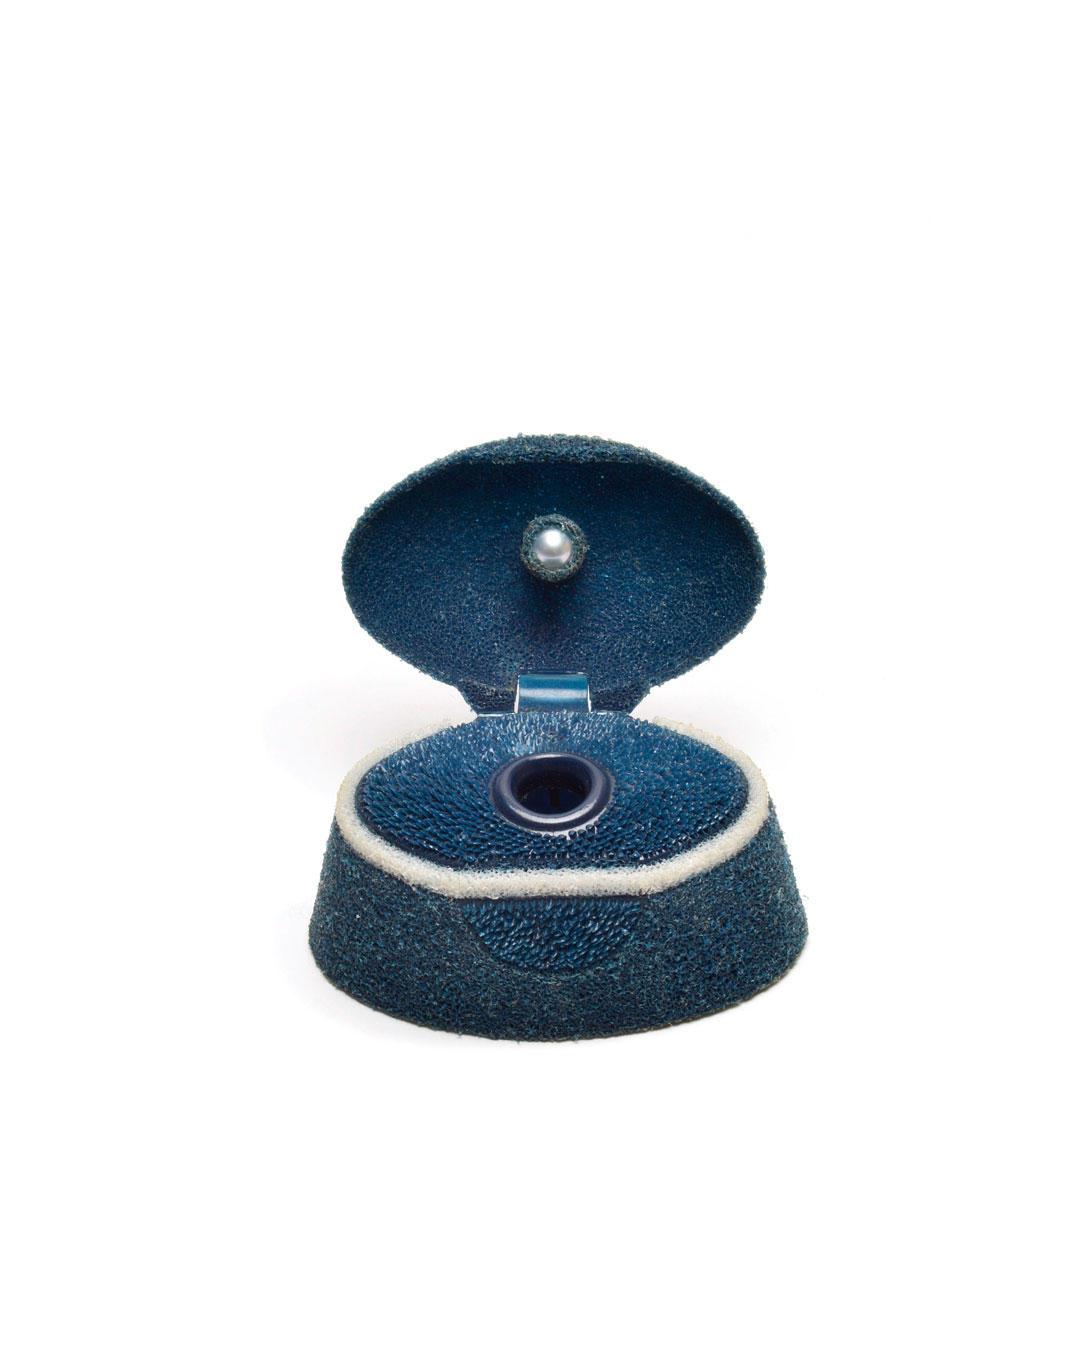 Ute Eitzenhöfer, Ensha, 2002, brooch; shampoo lid, pearl, rhodanised silver, silver, 40 x 40 x 45 mm